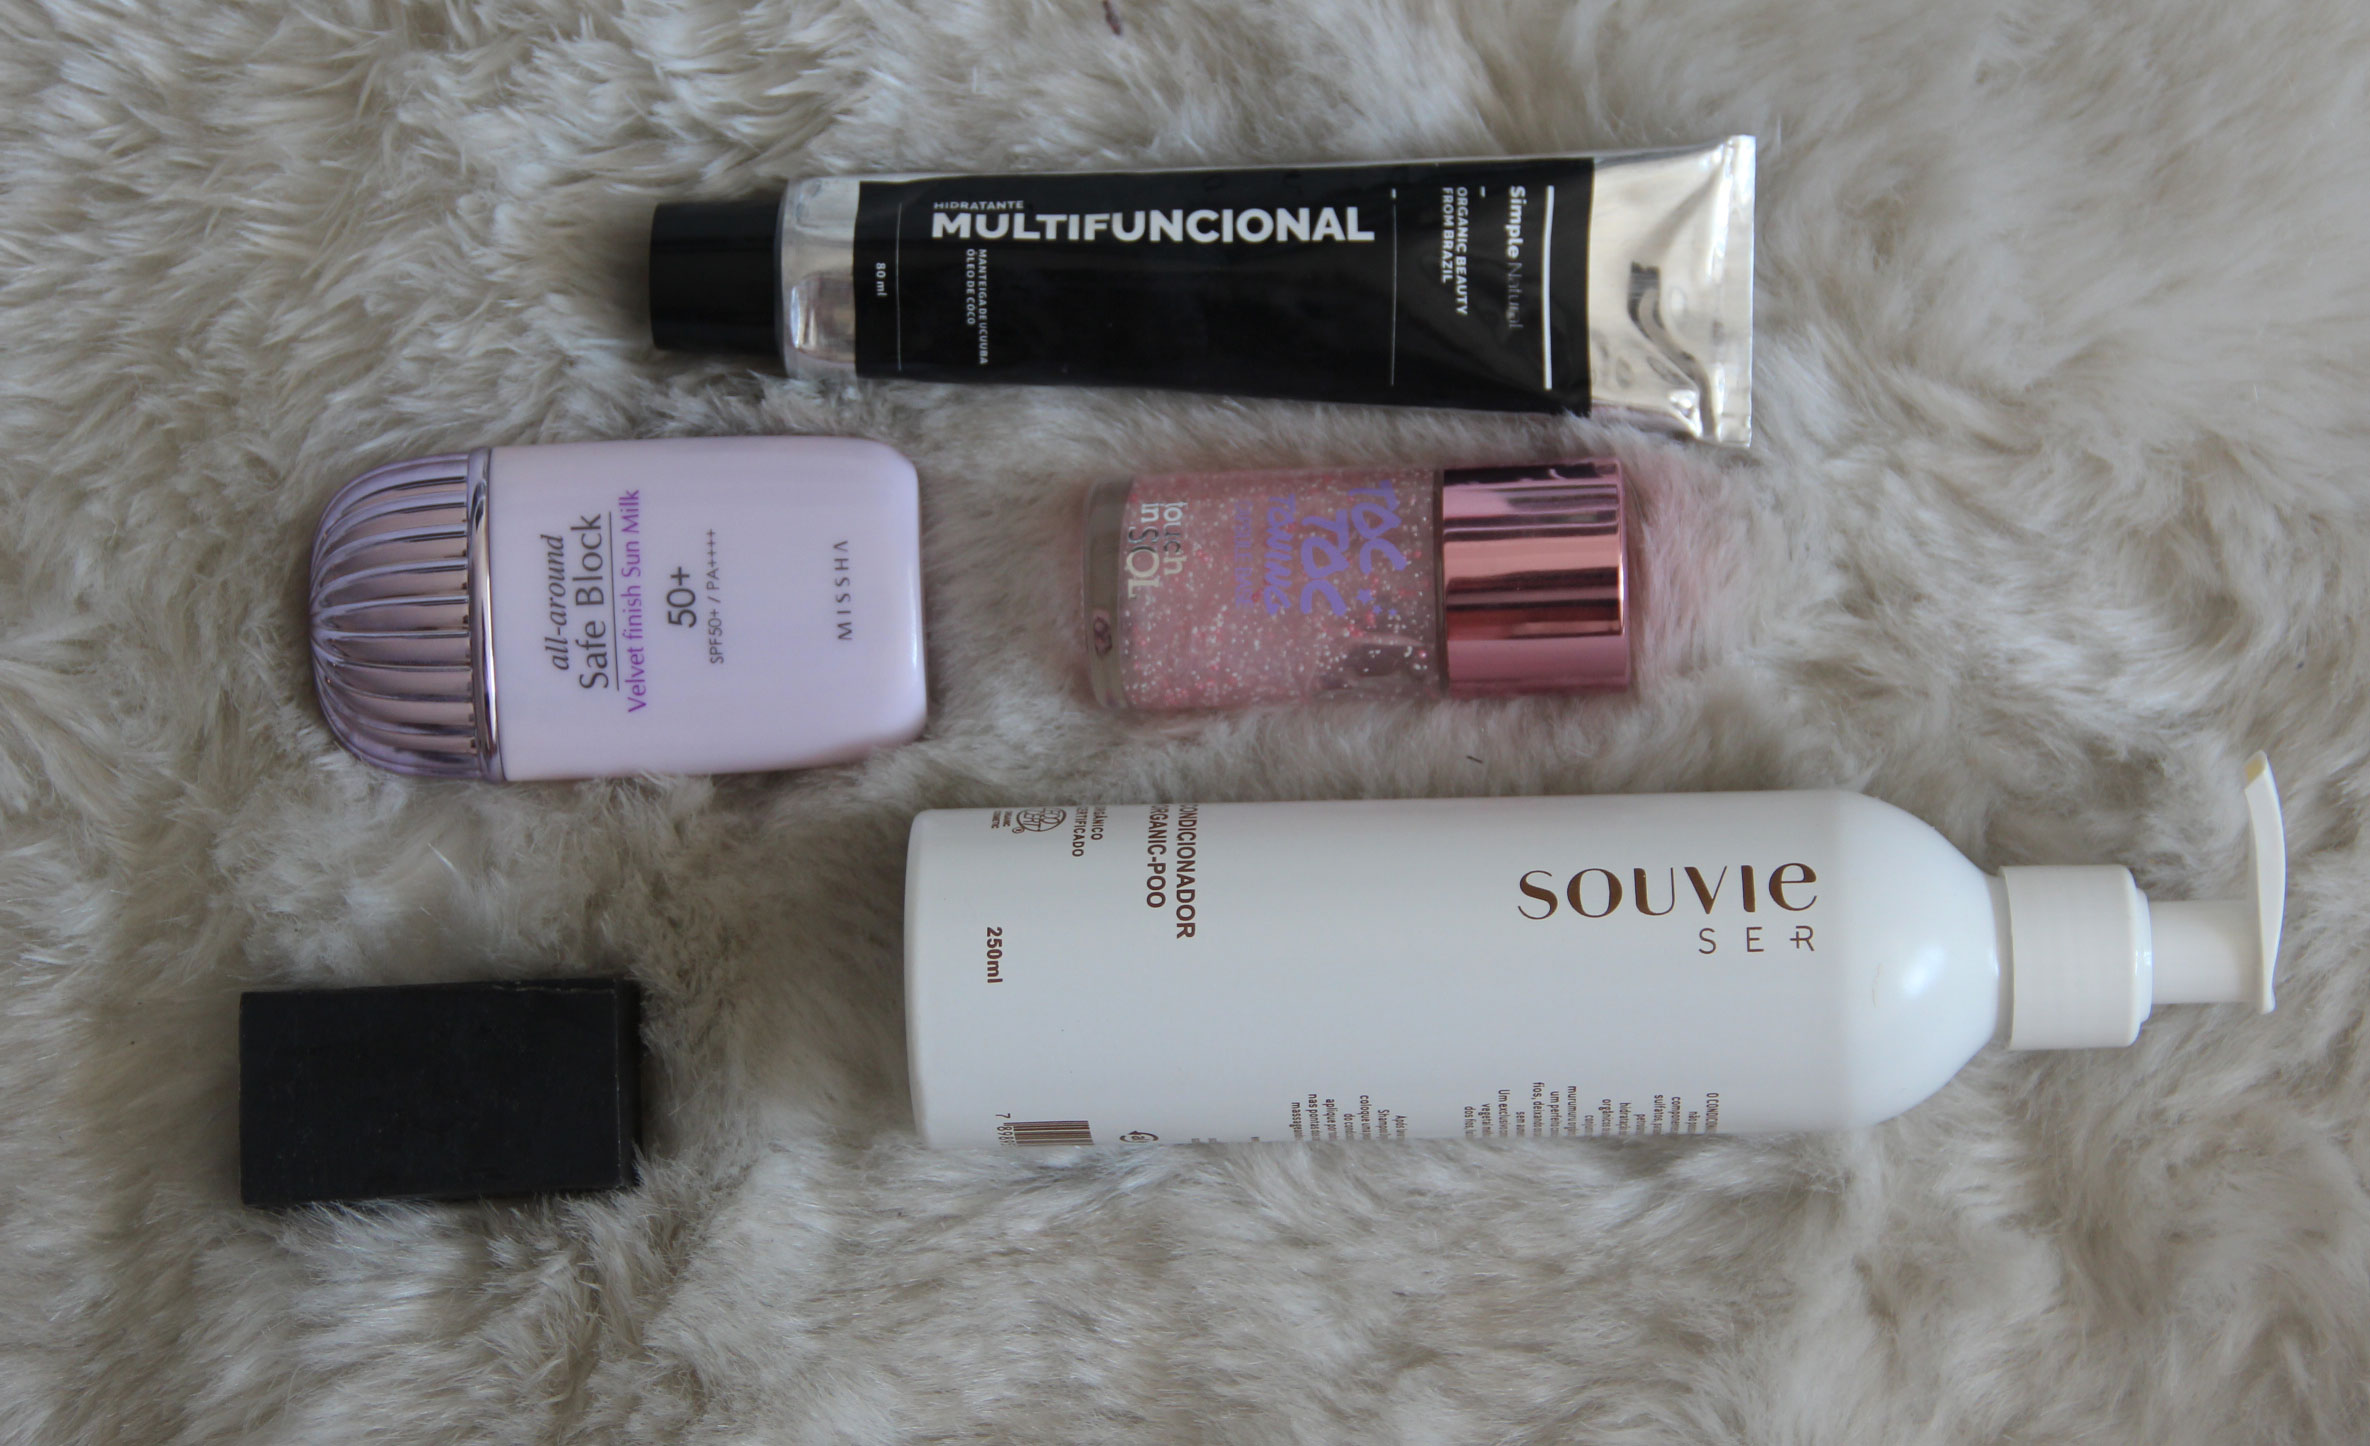 marcas de cosméticos que vale a pena conhecer